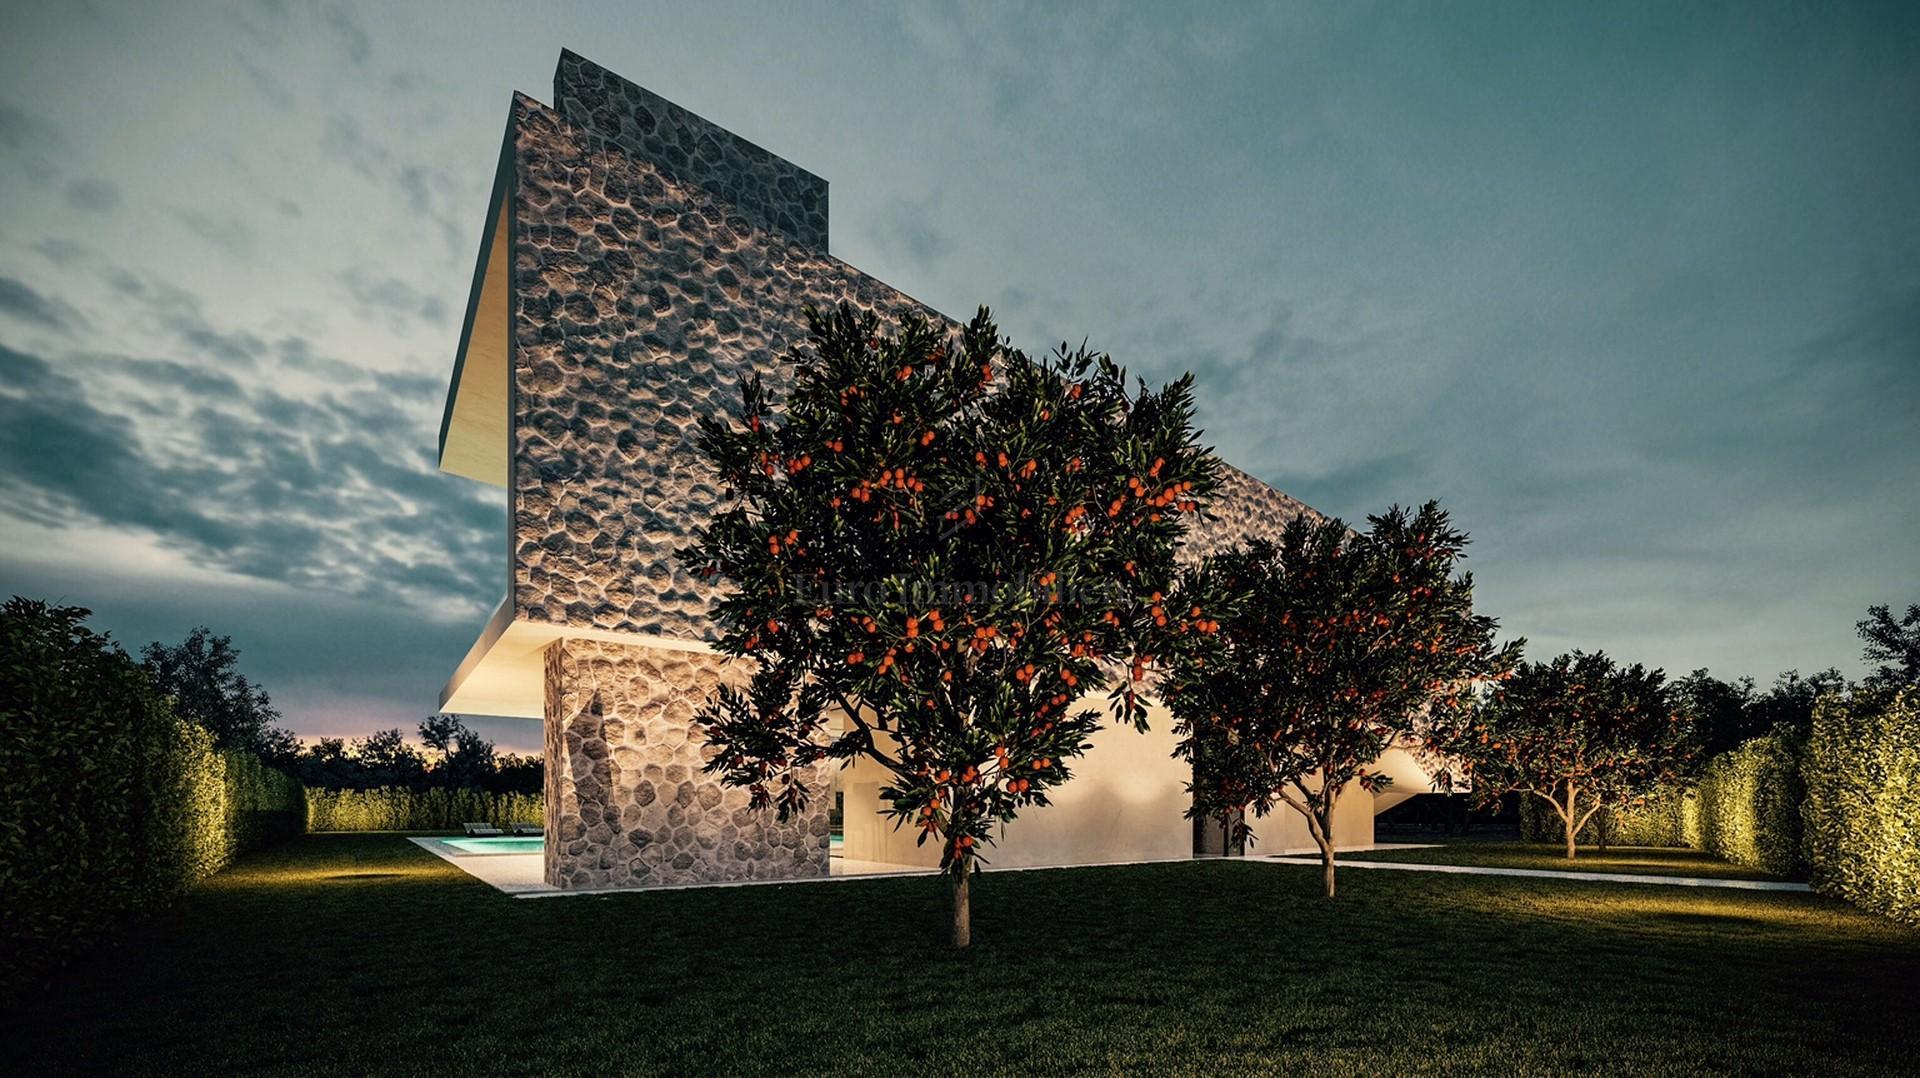 Građevinsko zemlijšte sa jedinstvenim projektom moderne vile